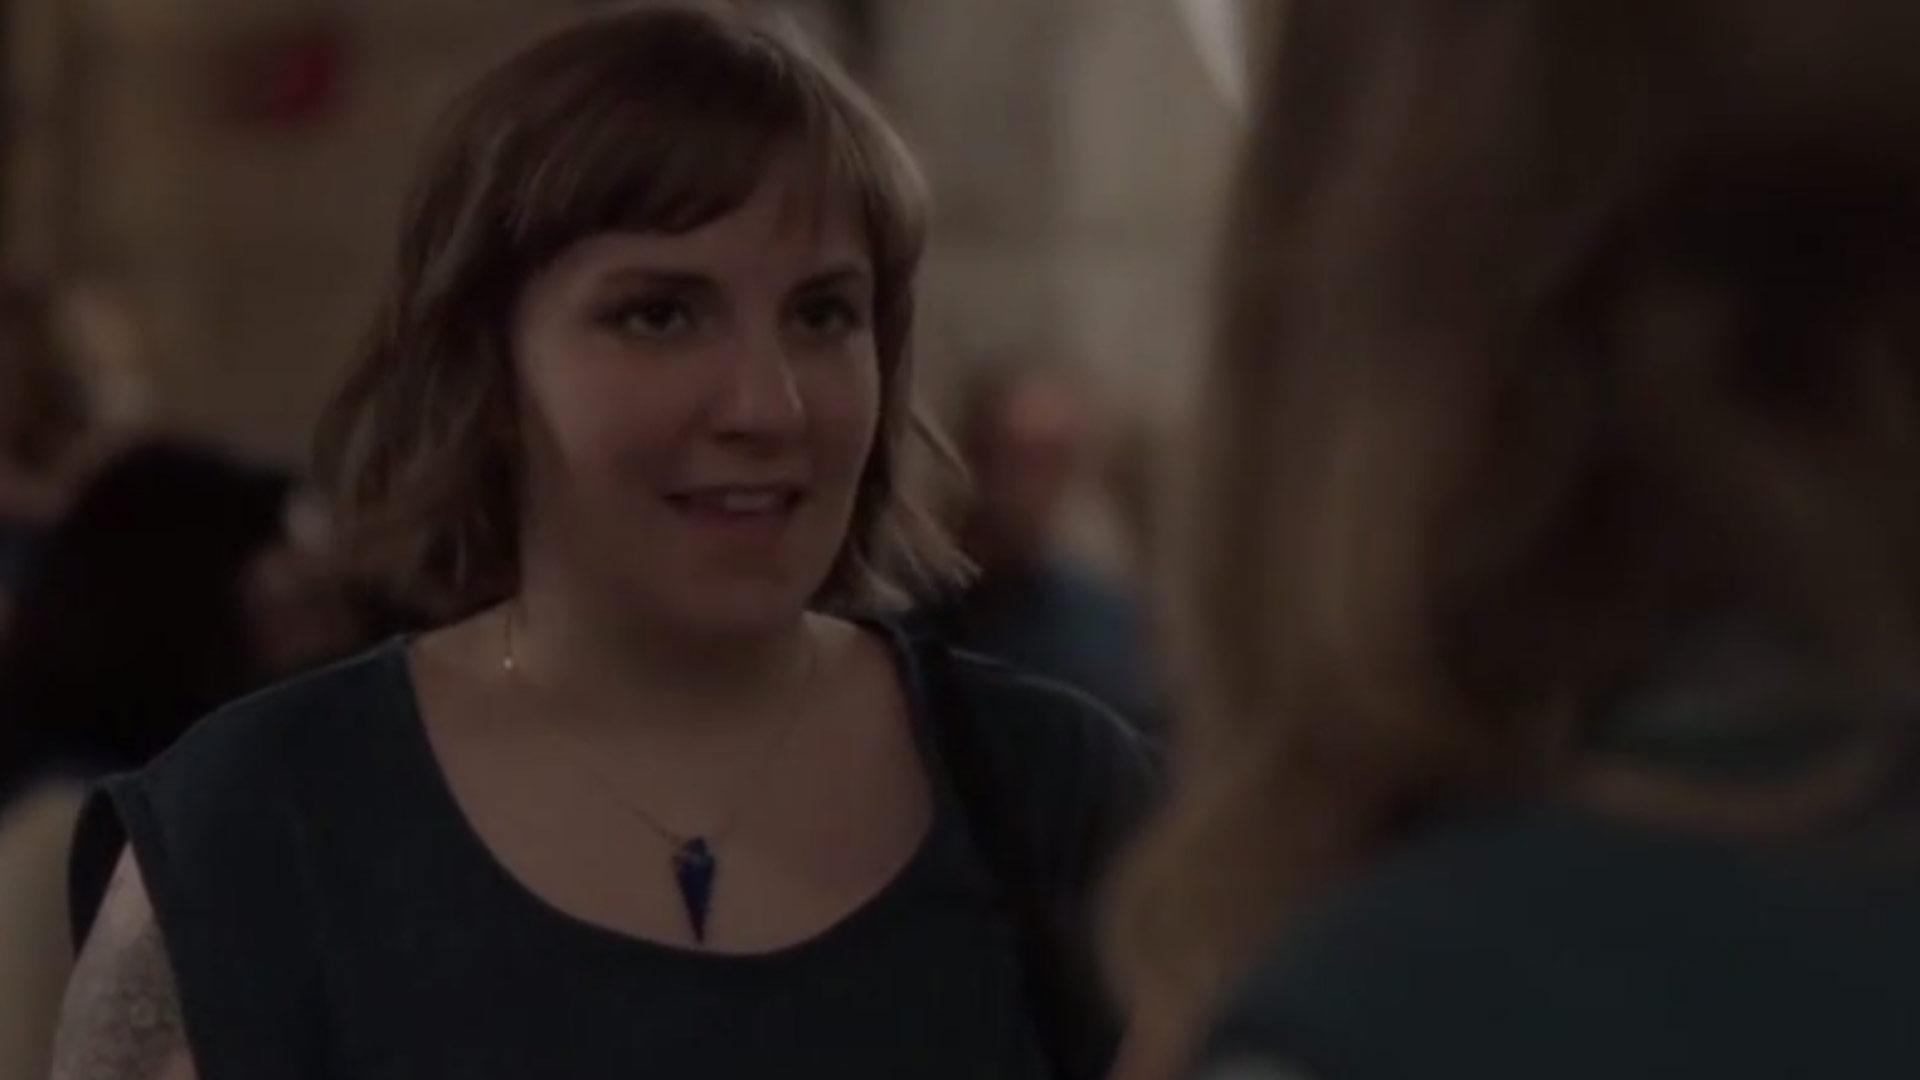 Tricia Brock (director)